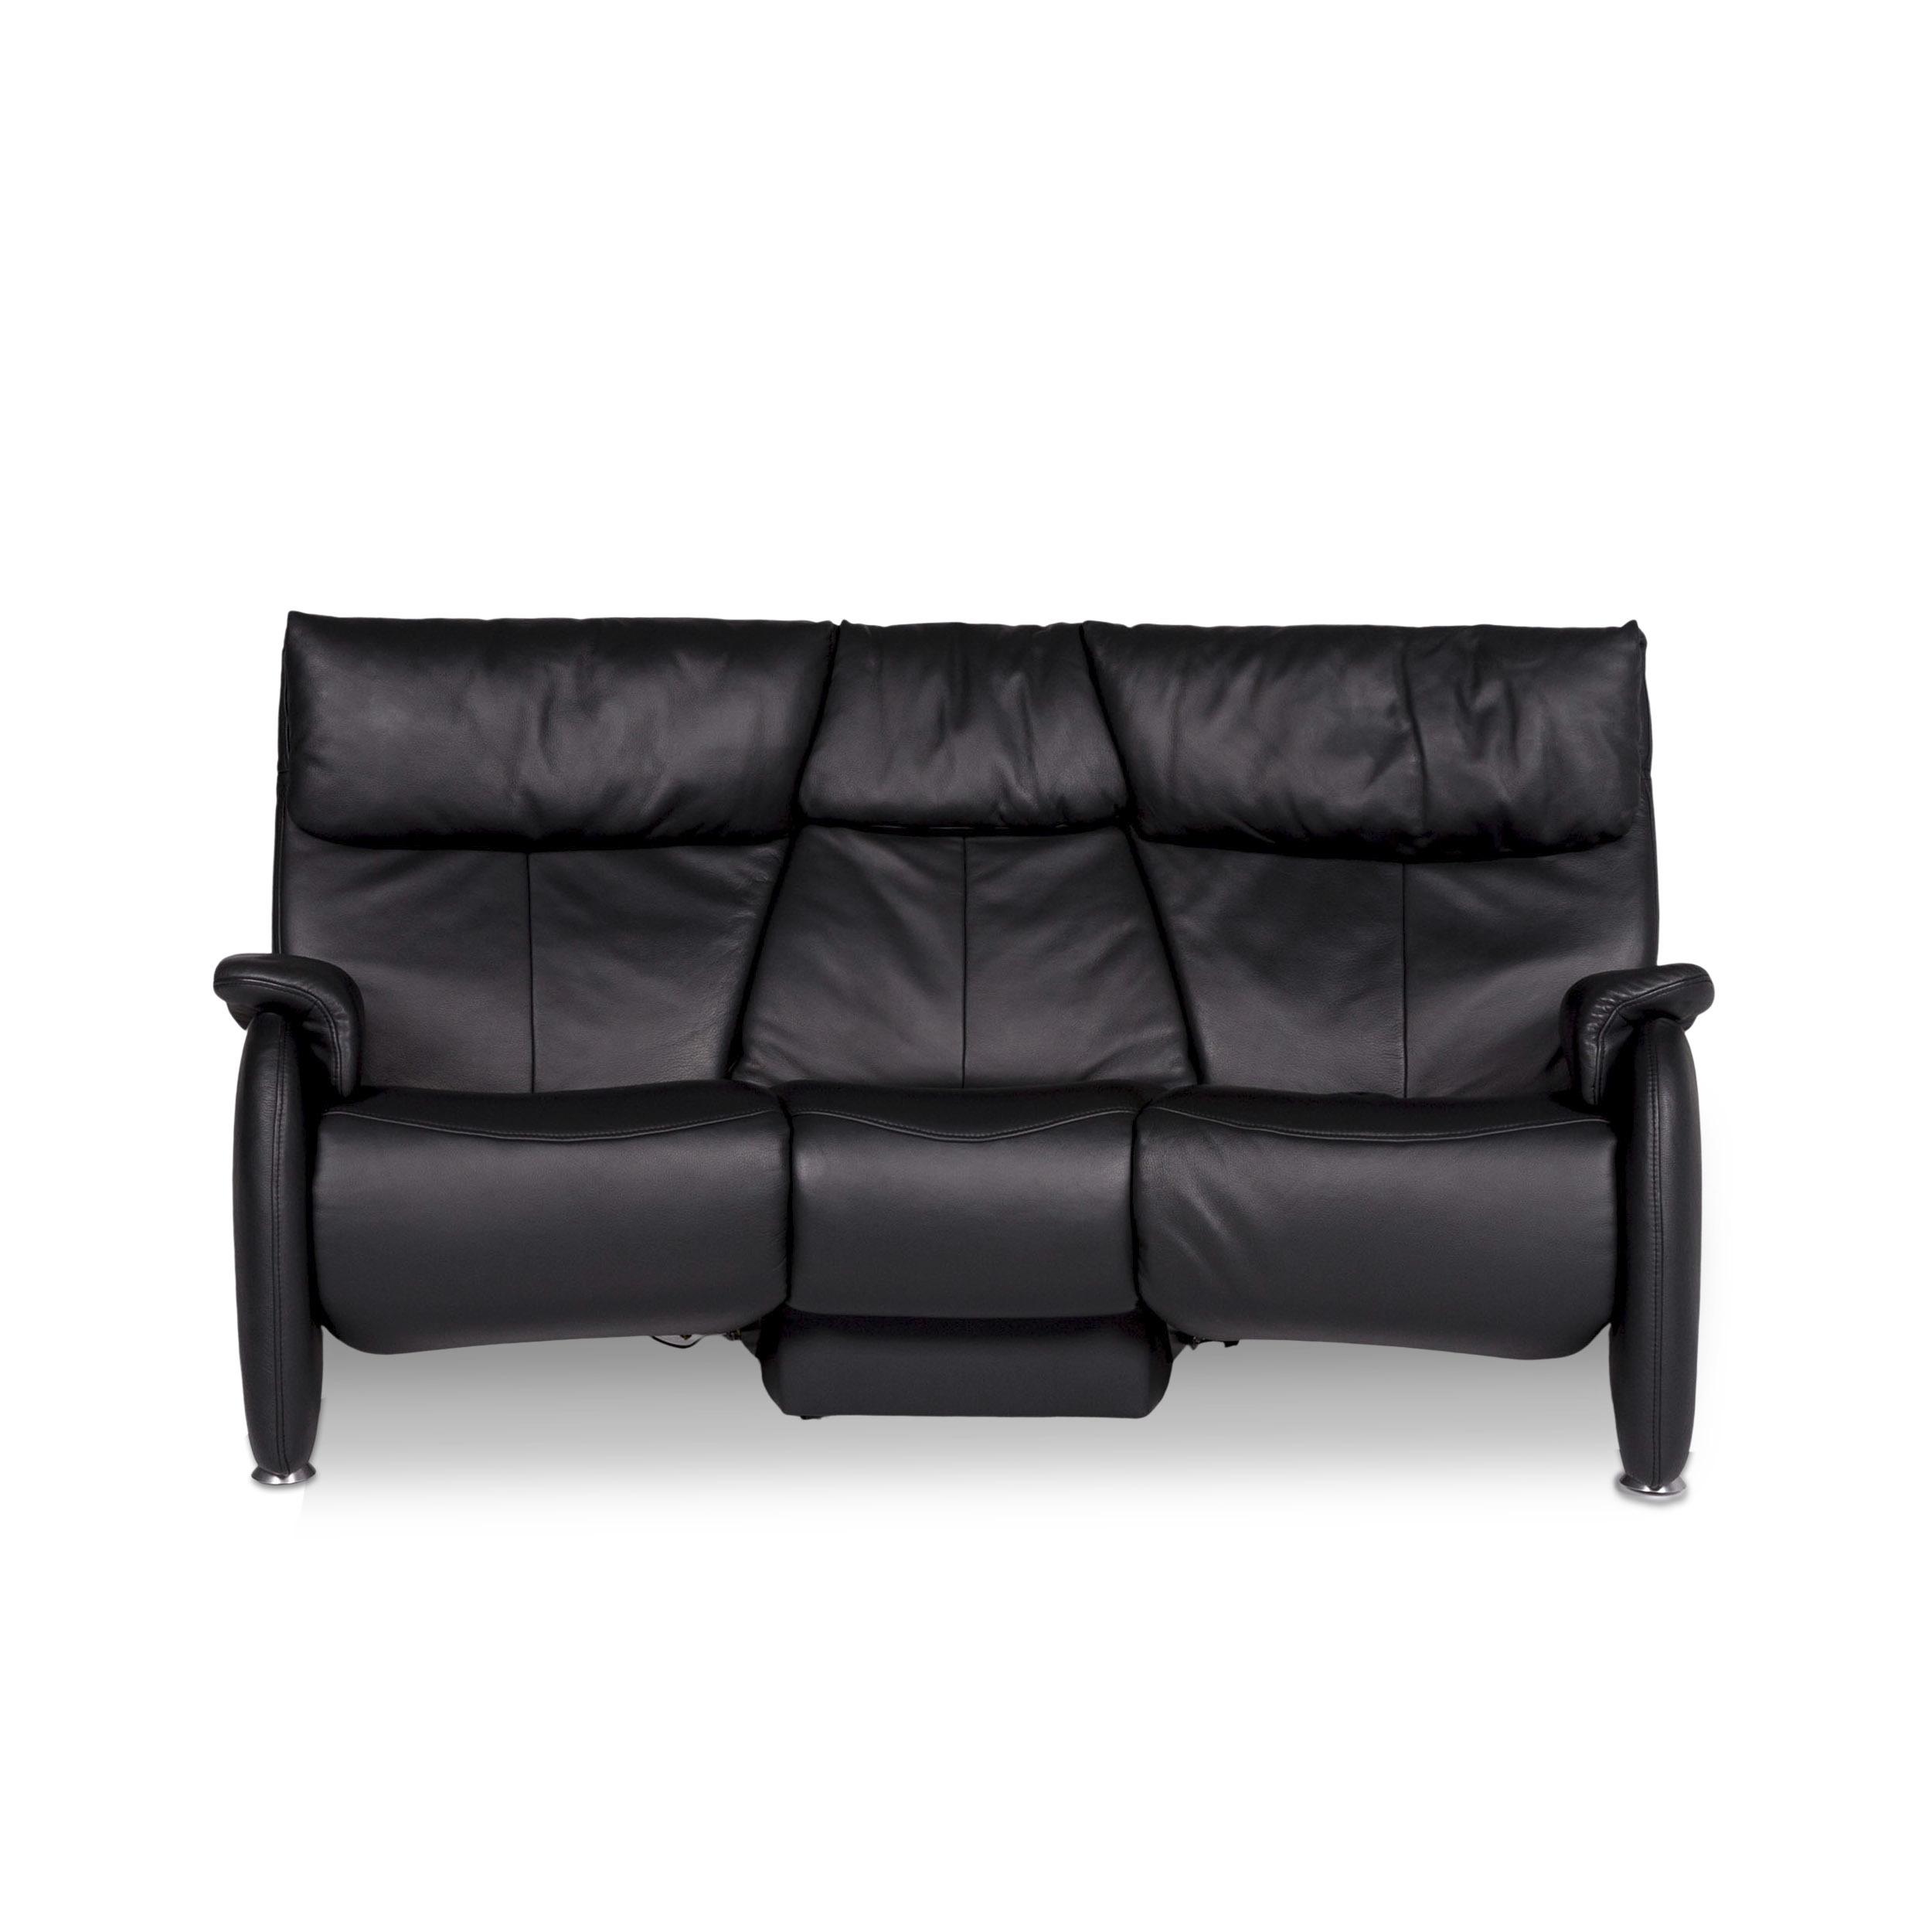 Sofa Dreisitzer Grau / Lc Home 3er Sofa Dreisitzer Couch ...